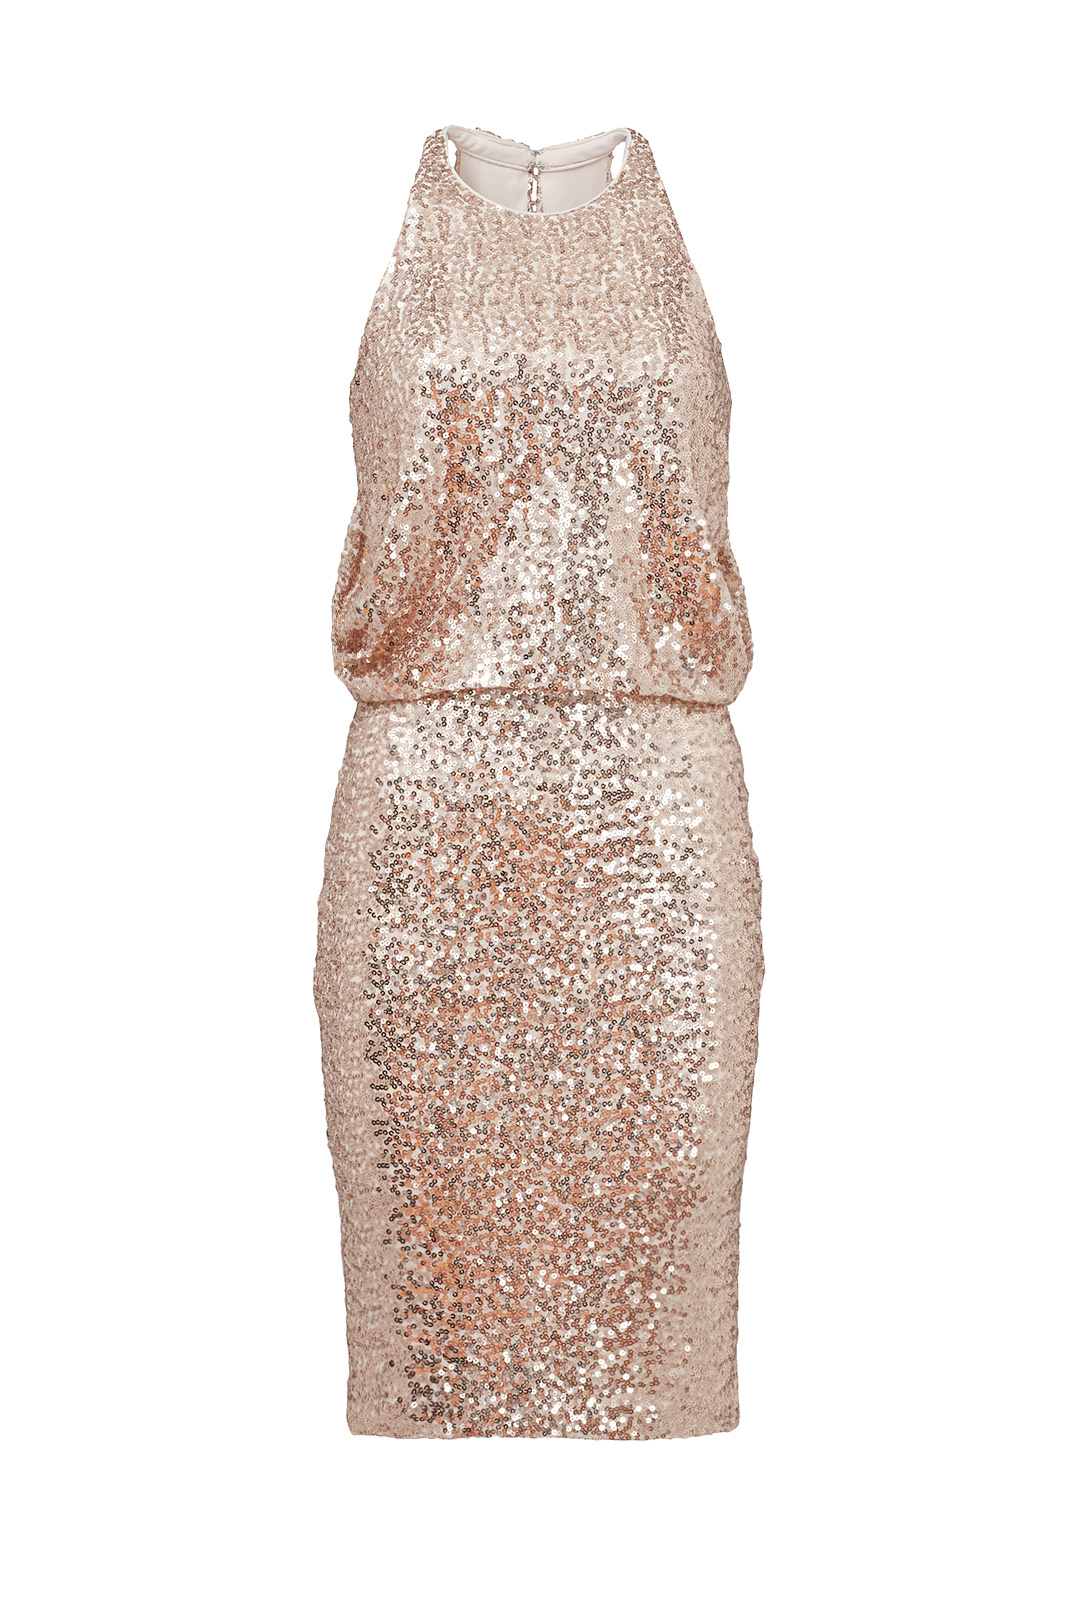 Badgley Mischka - Blush Maria Dress